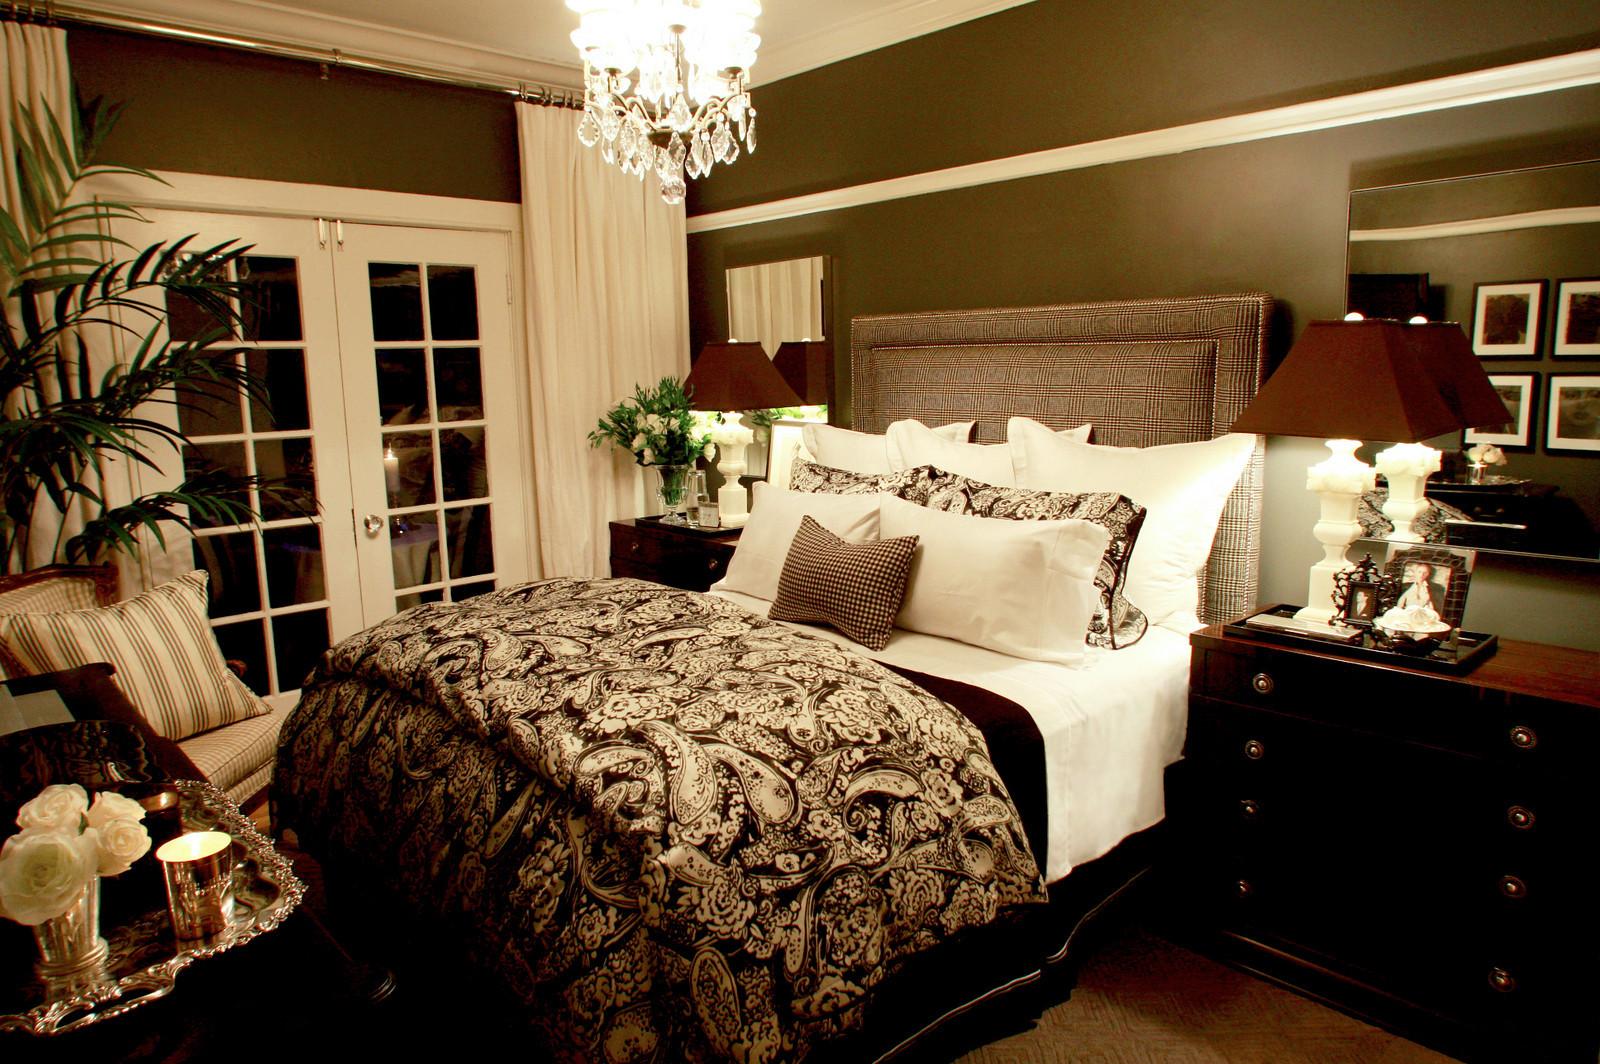 Scot Meacham Wood Design - Presidio Heights Bedroom .jpg